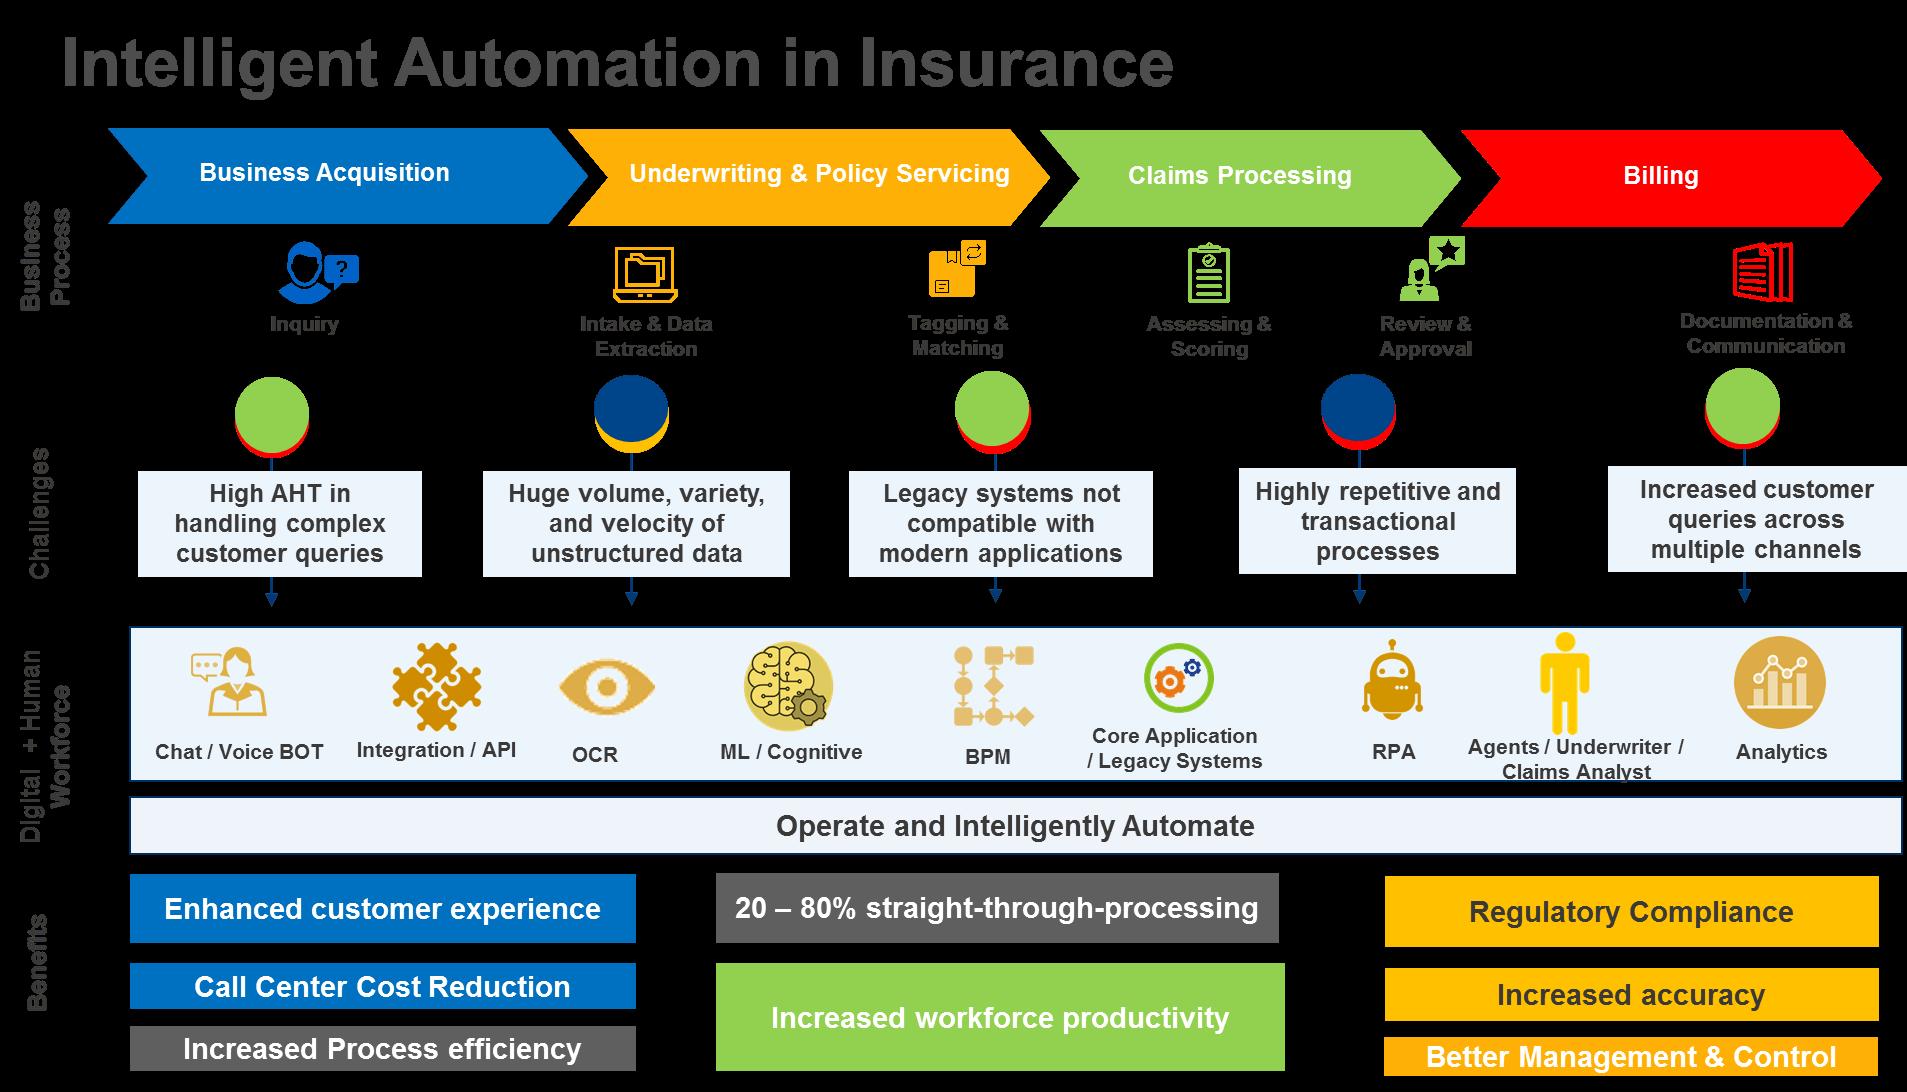 Robotic Process Automation Powers Digital Transformation Insurers